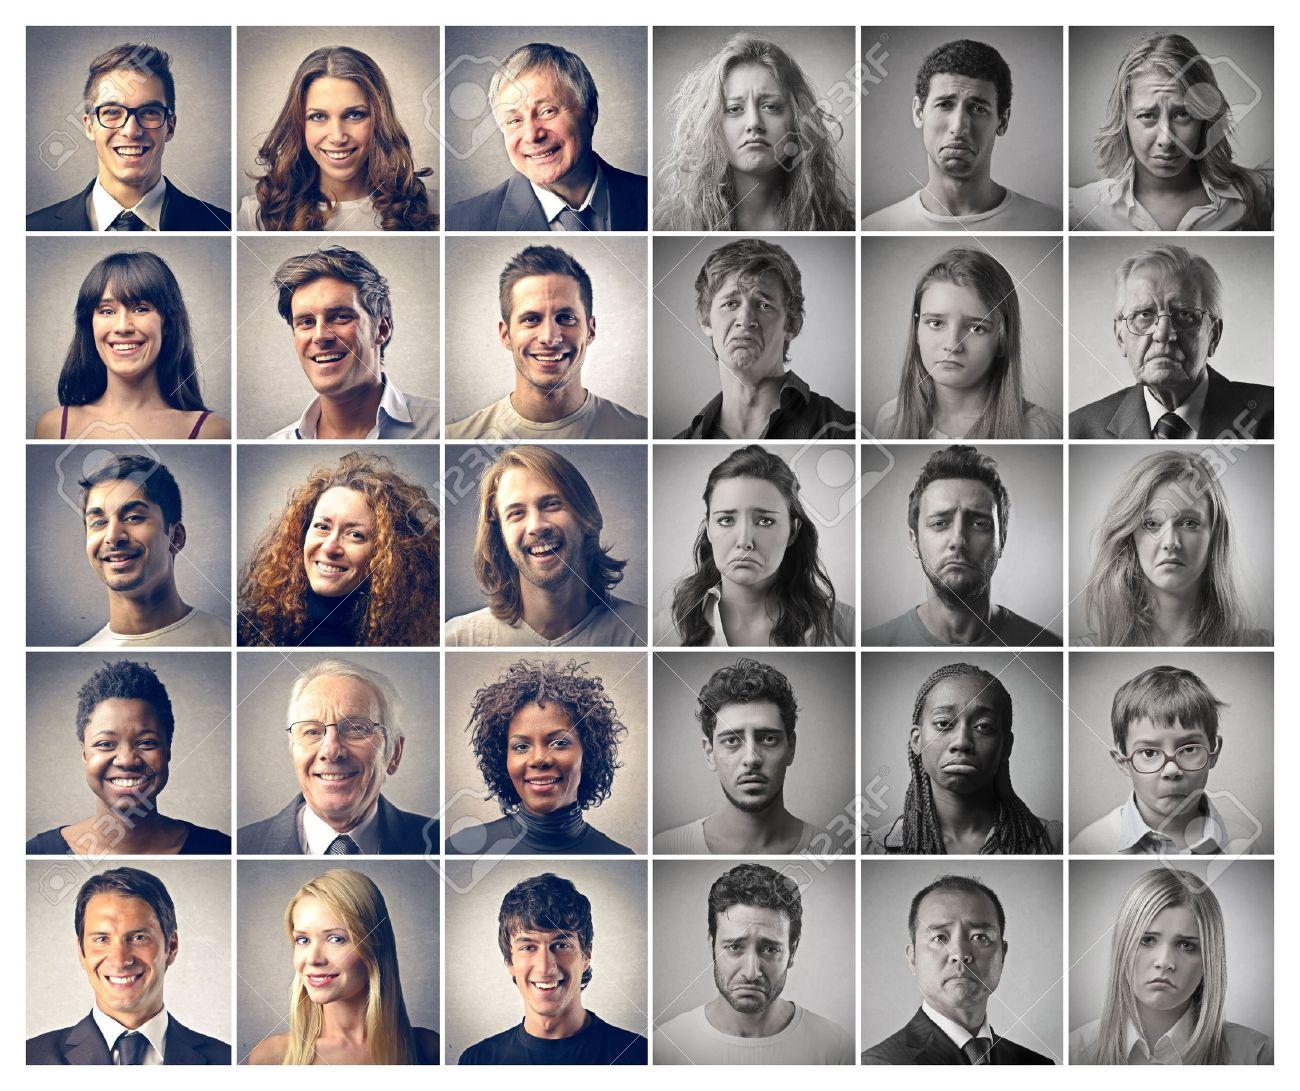 mosaic portraits people happy and sad Stock Photo - 17692568